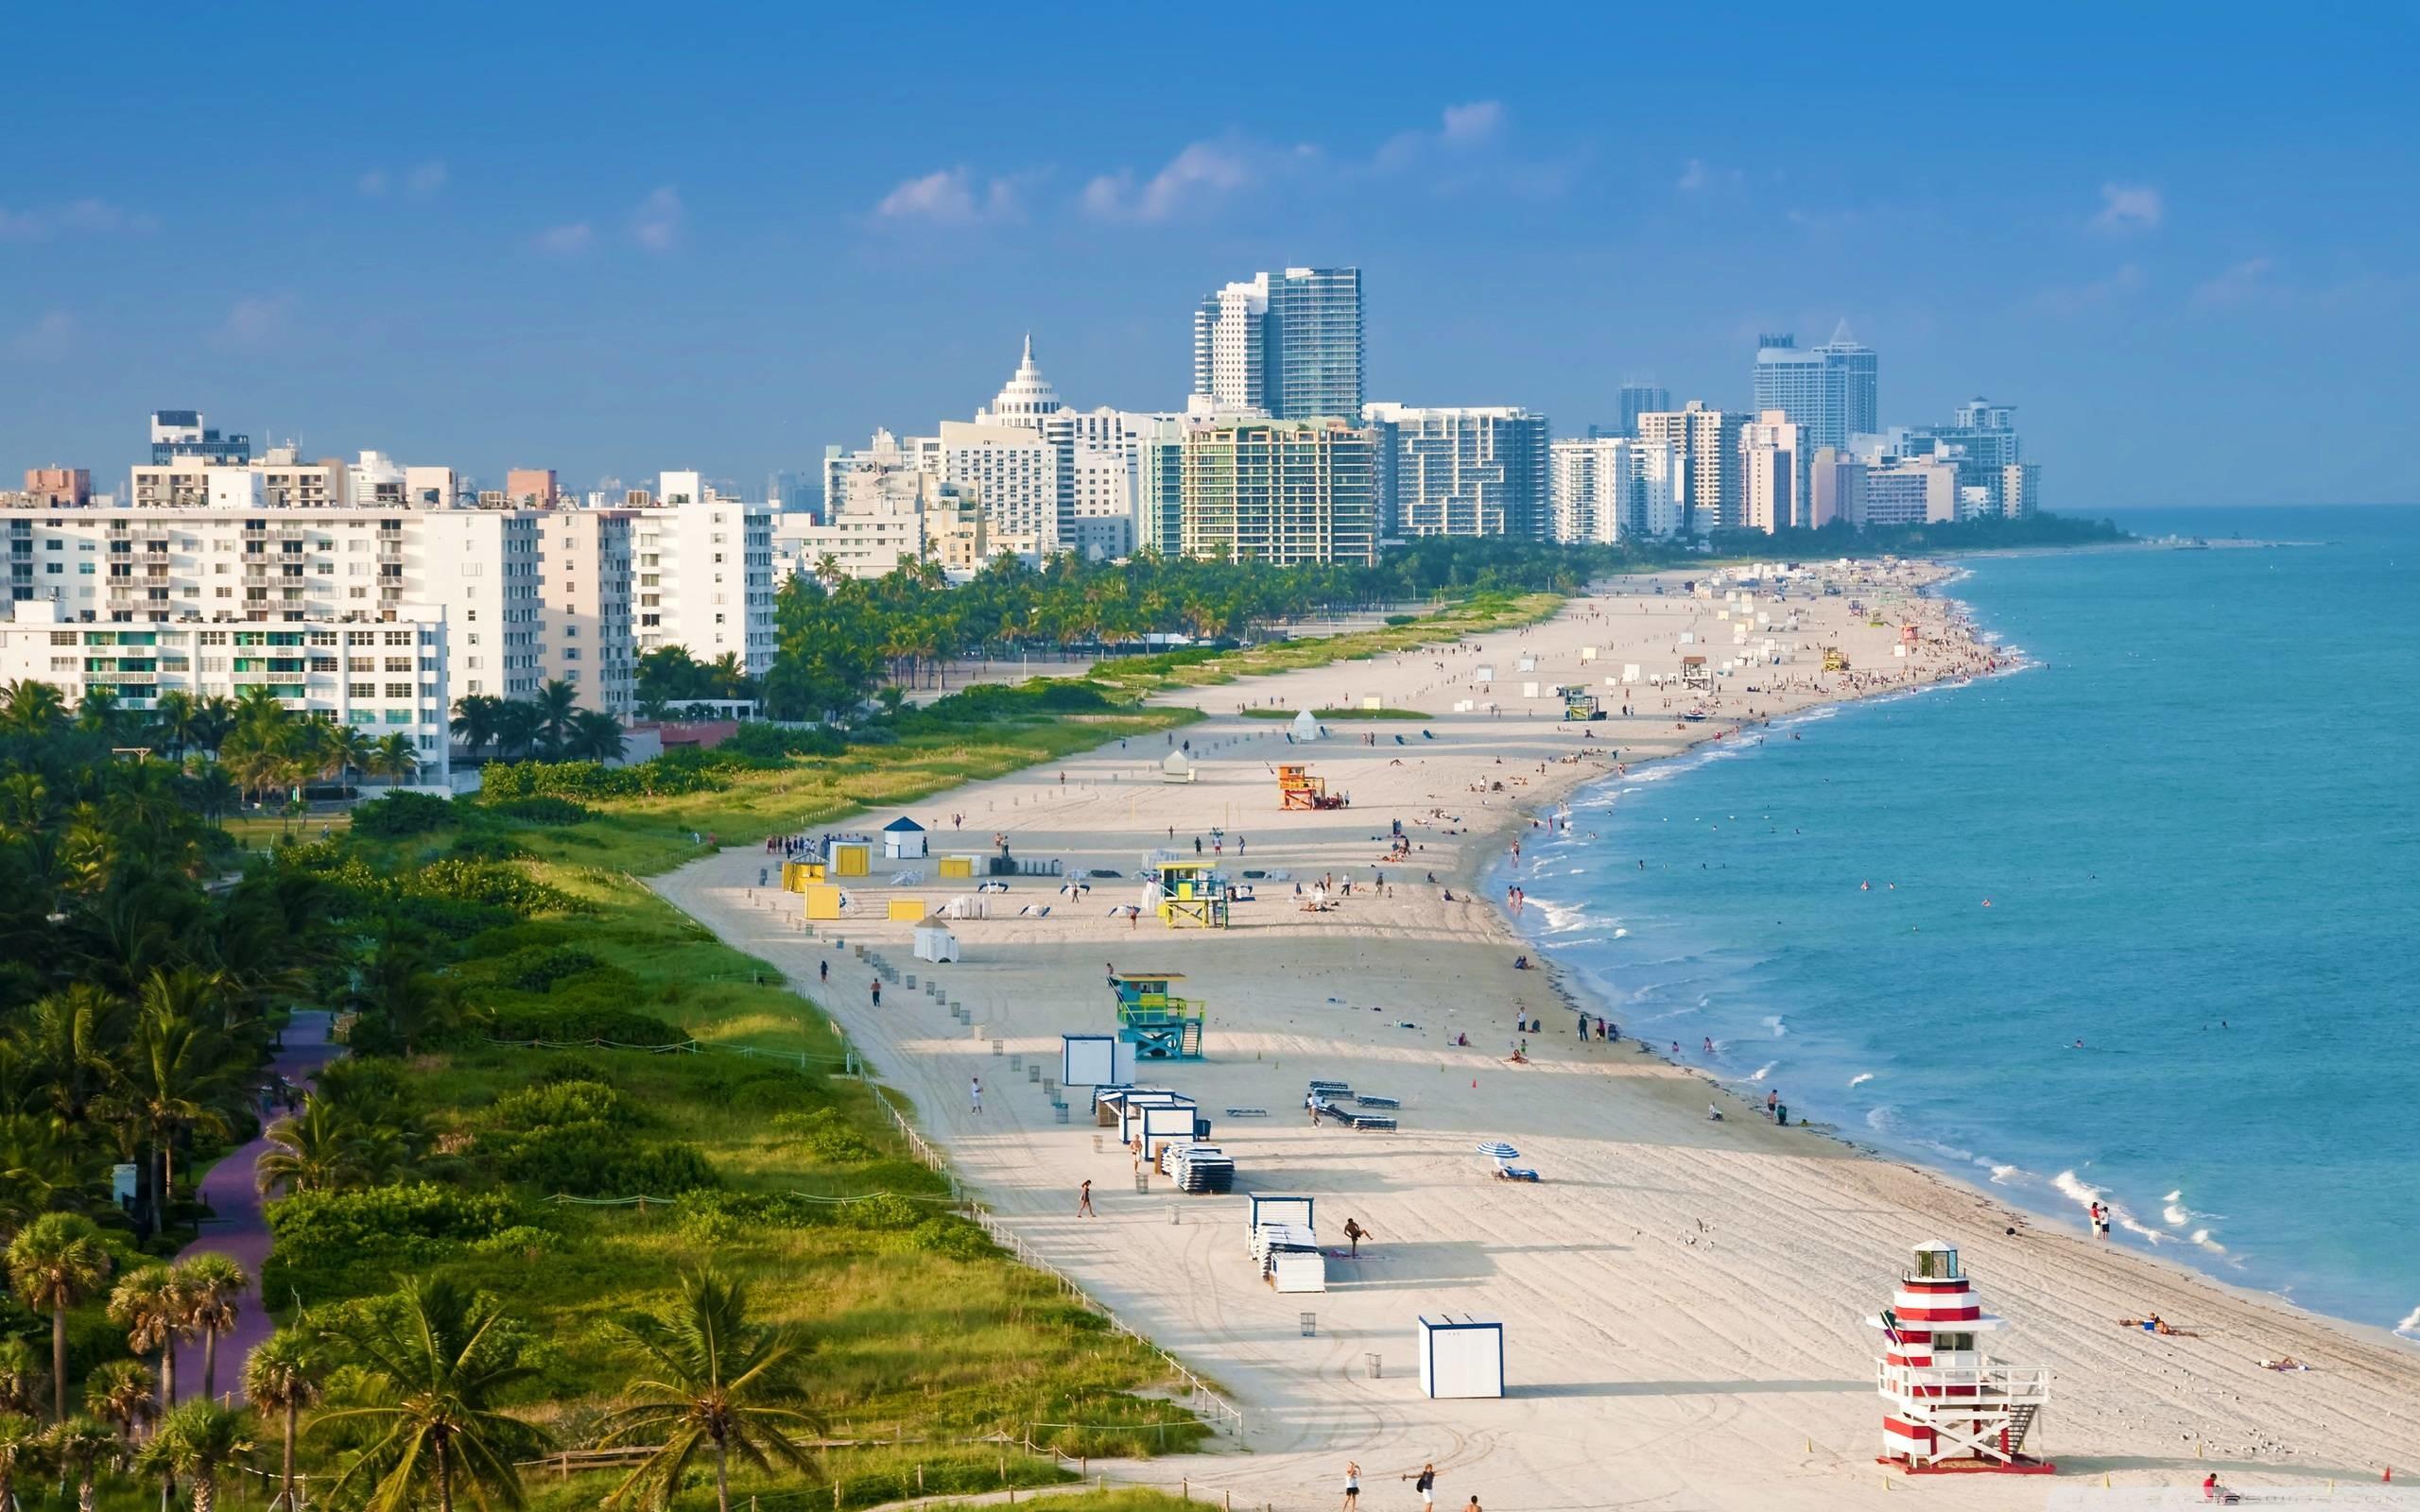 Fonds d'écran Miami Beach : tous les wallpapers Miami Beach